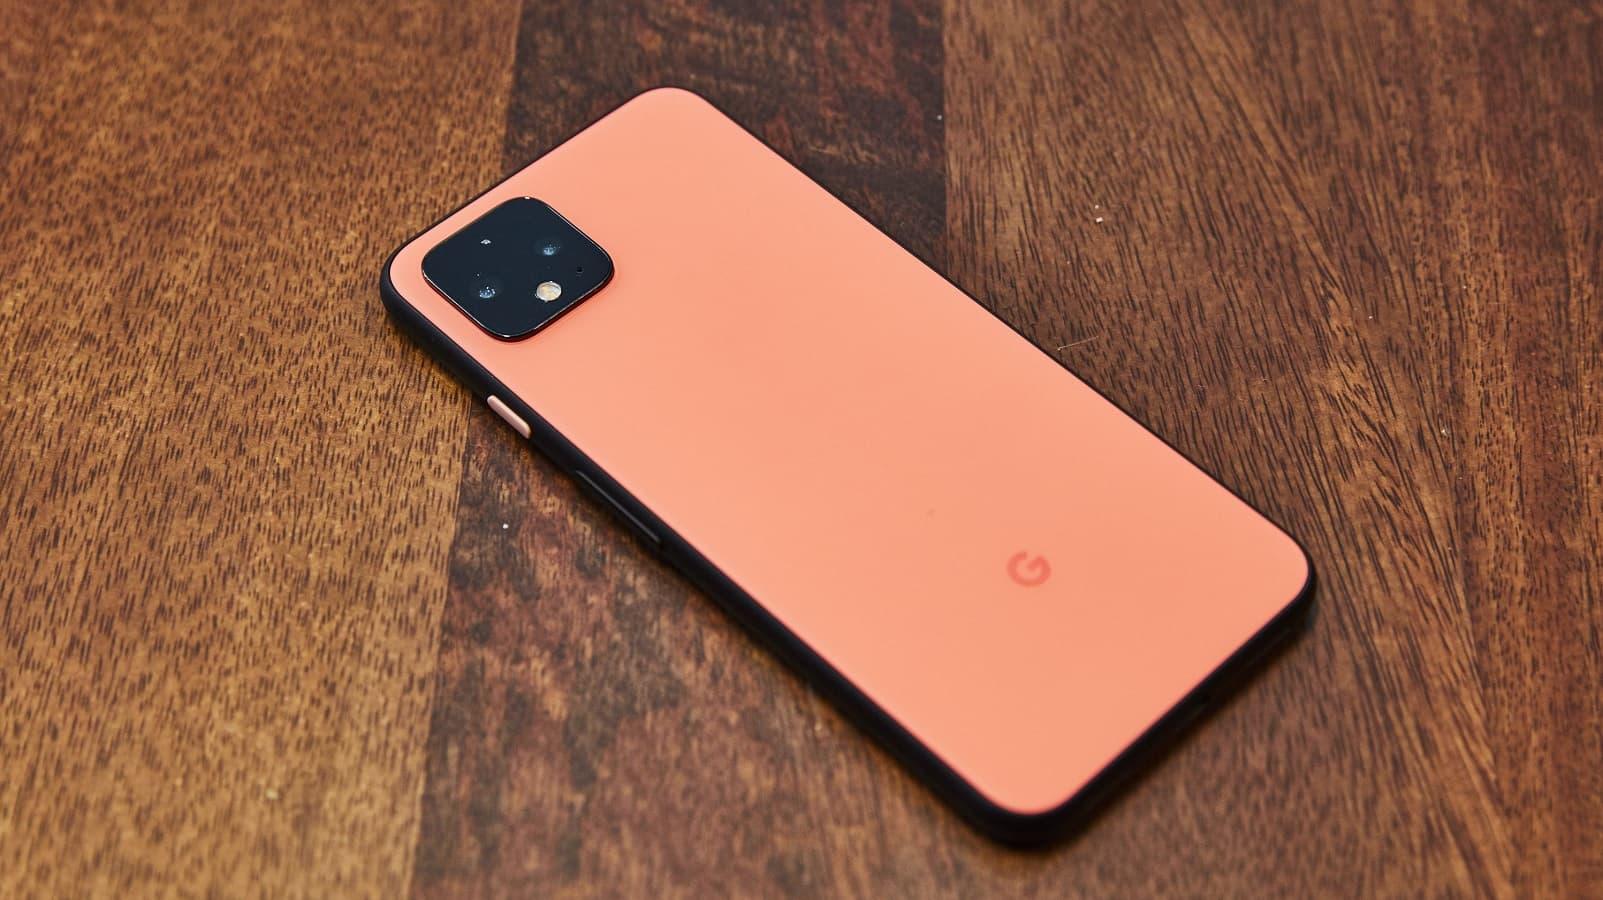 google pixel 4 on table oh so orange